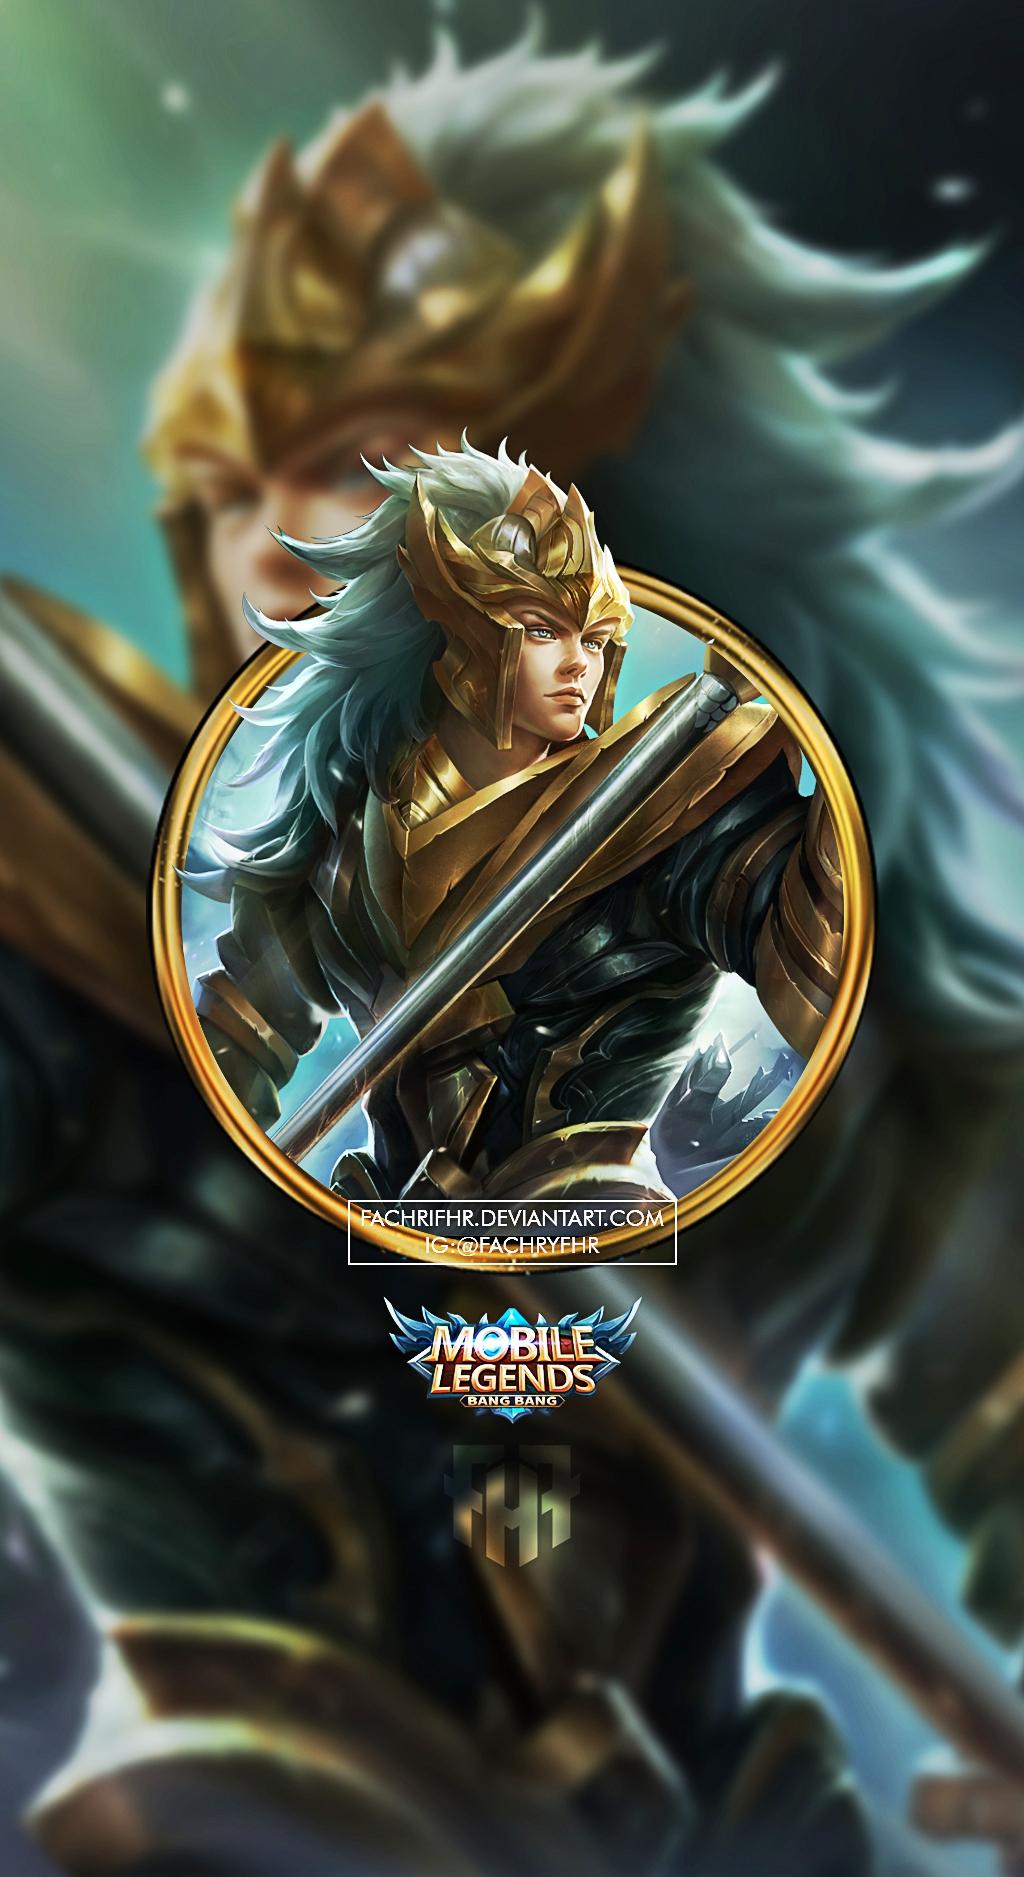 Wallpaper Phone Zilong Elite Warrior By FachriFHR On DeviantArt